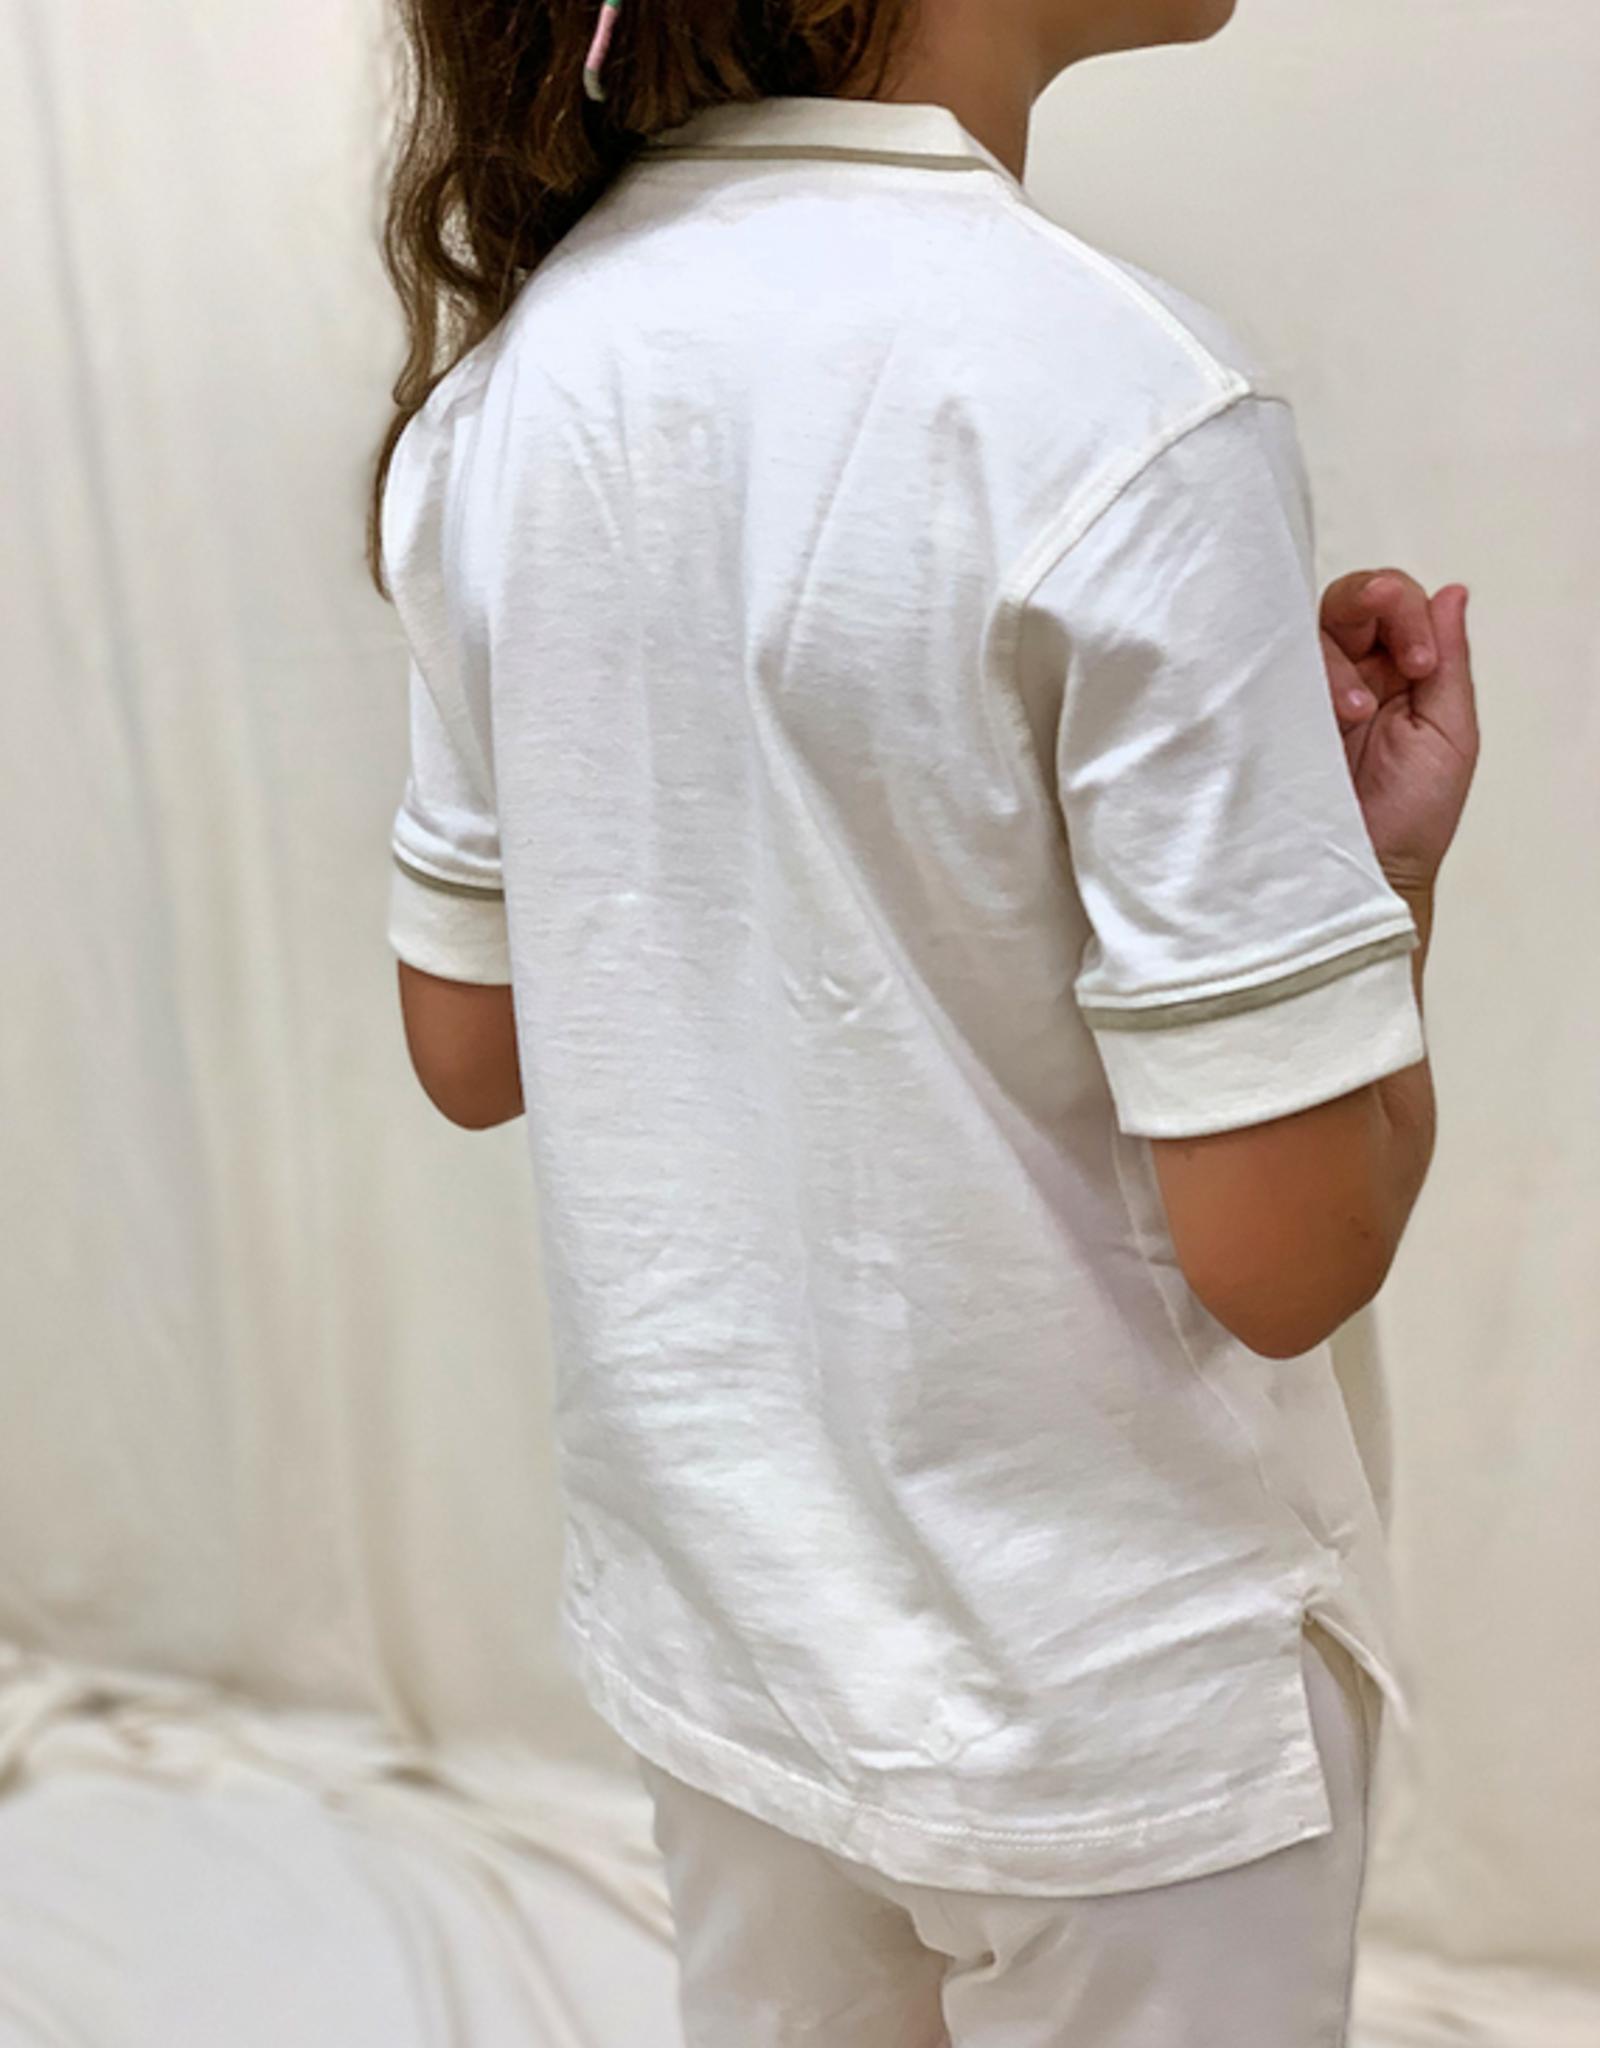 Pijama junior cerrado manga corta. Tallas 2, 4, 6 años.